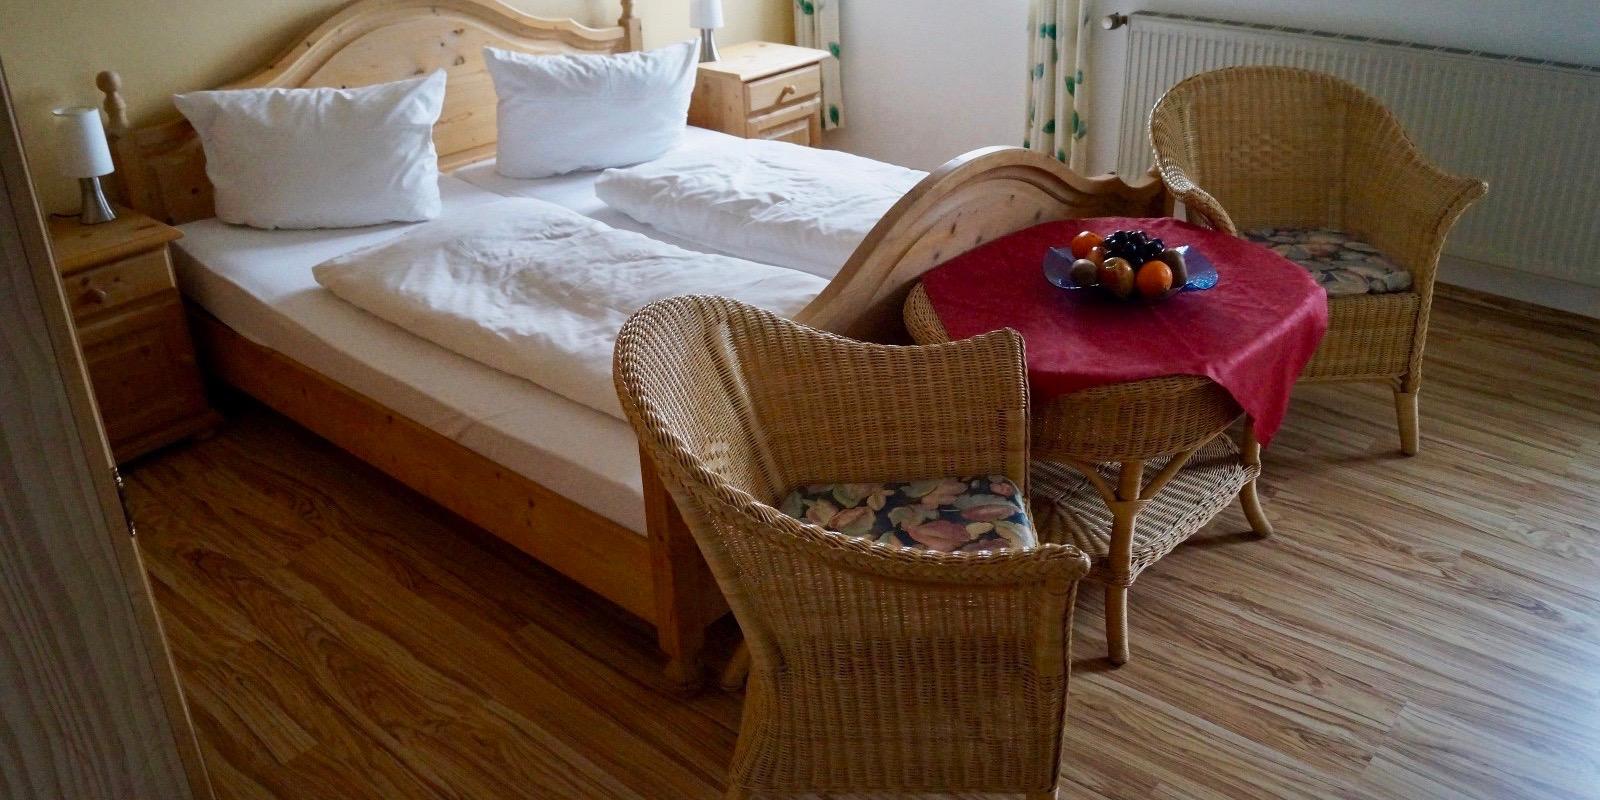 https://hotel-katzenstein.de/wp-content/uploads/2017/08/DZ_Comfort_28x4.jpg